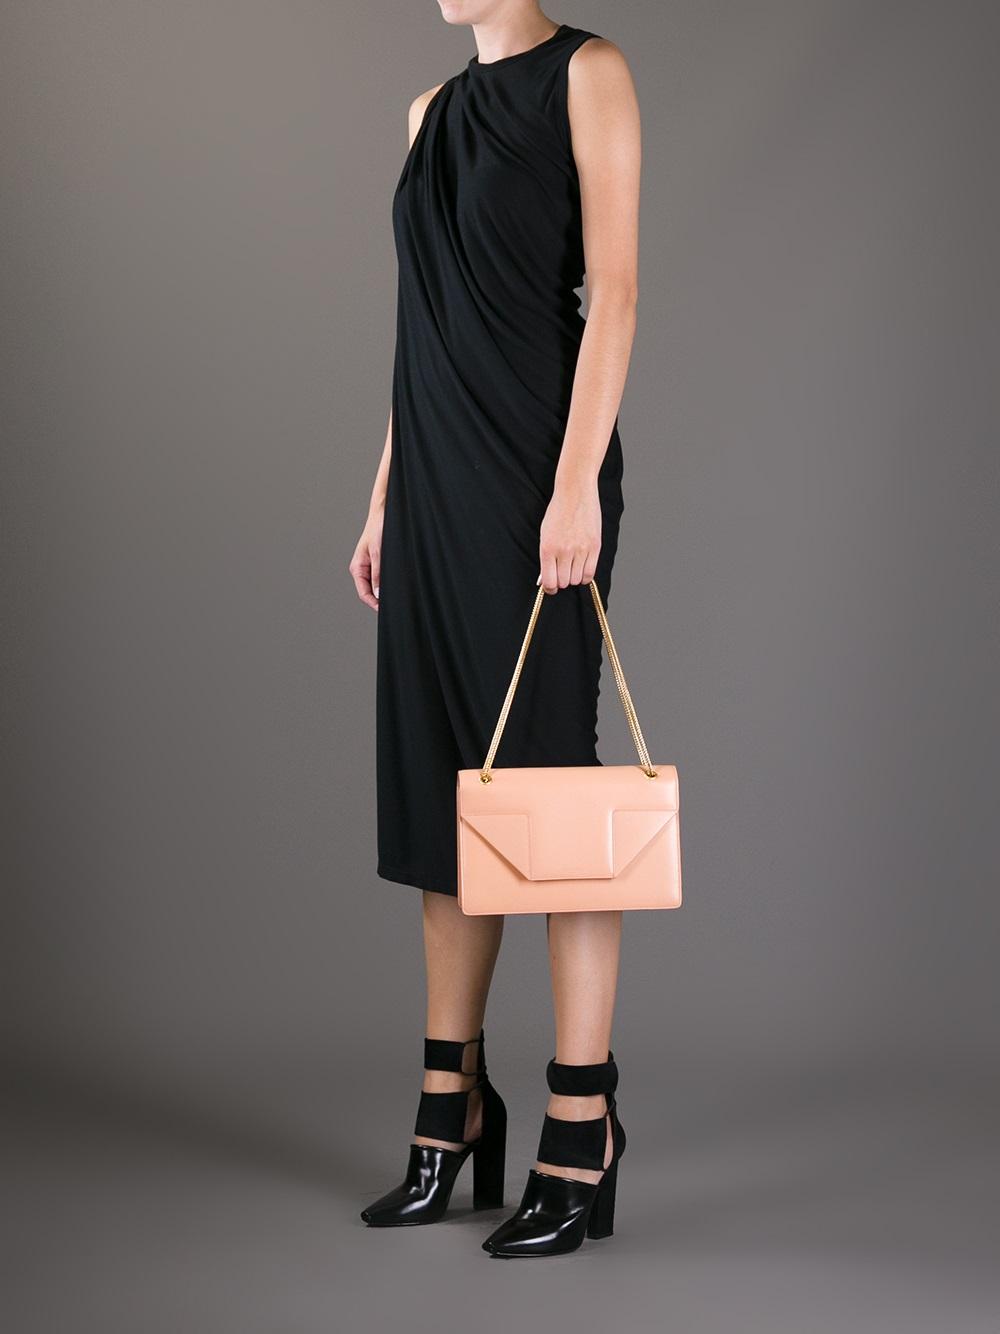 95ed50d4499 Saint Laurent Pink Medium Betty Bag